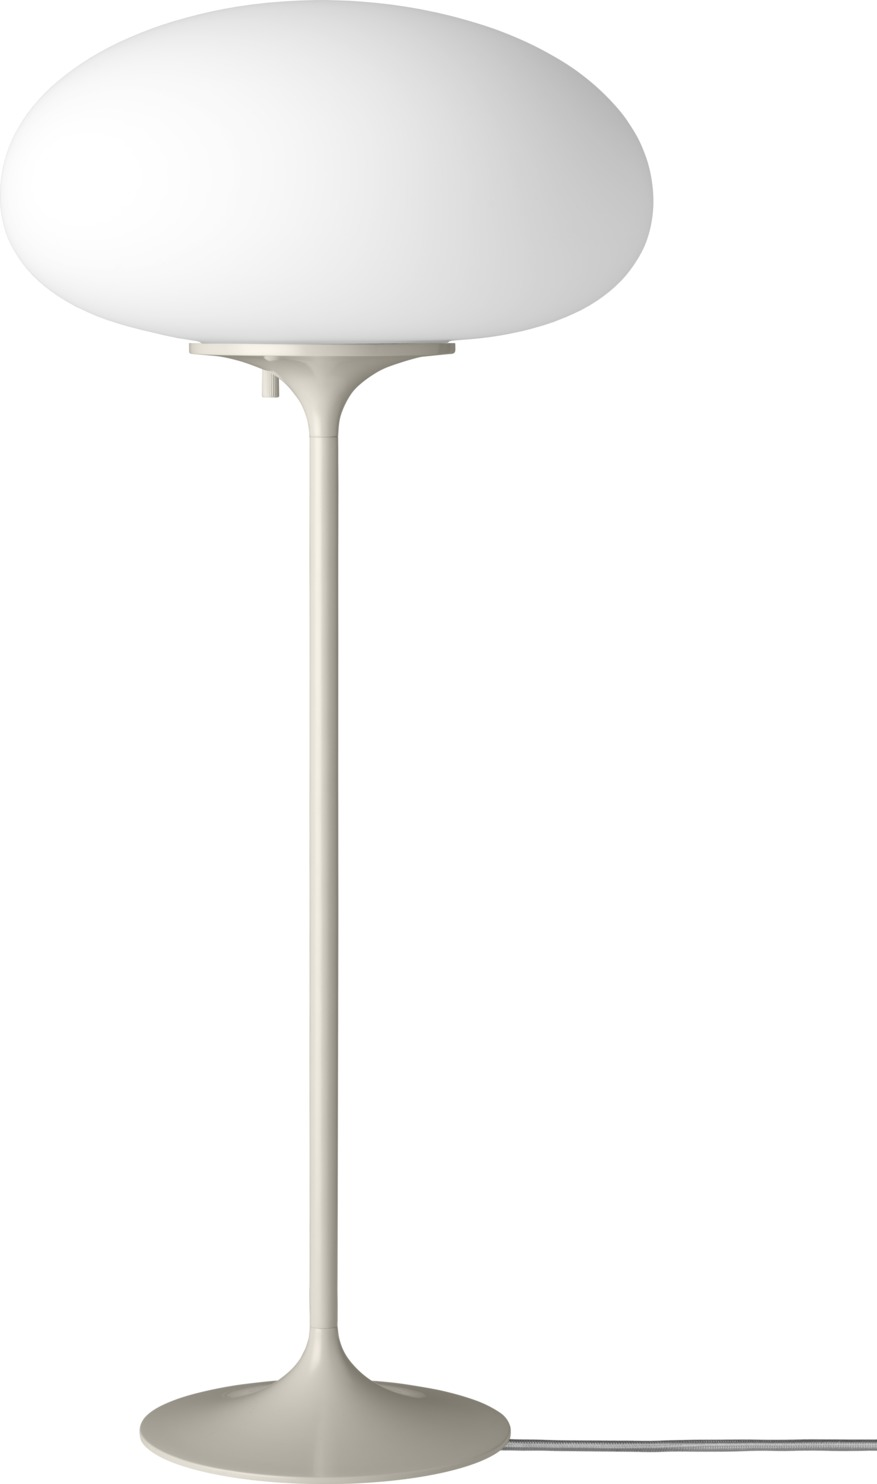 Bordlampe Stemlite Bill Curry Gubi